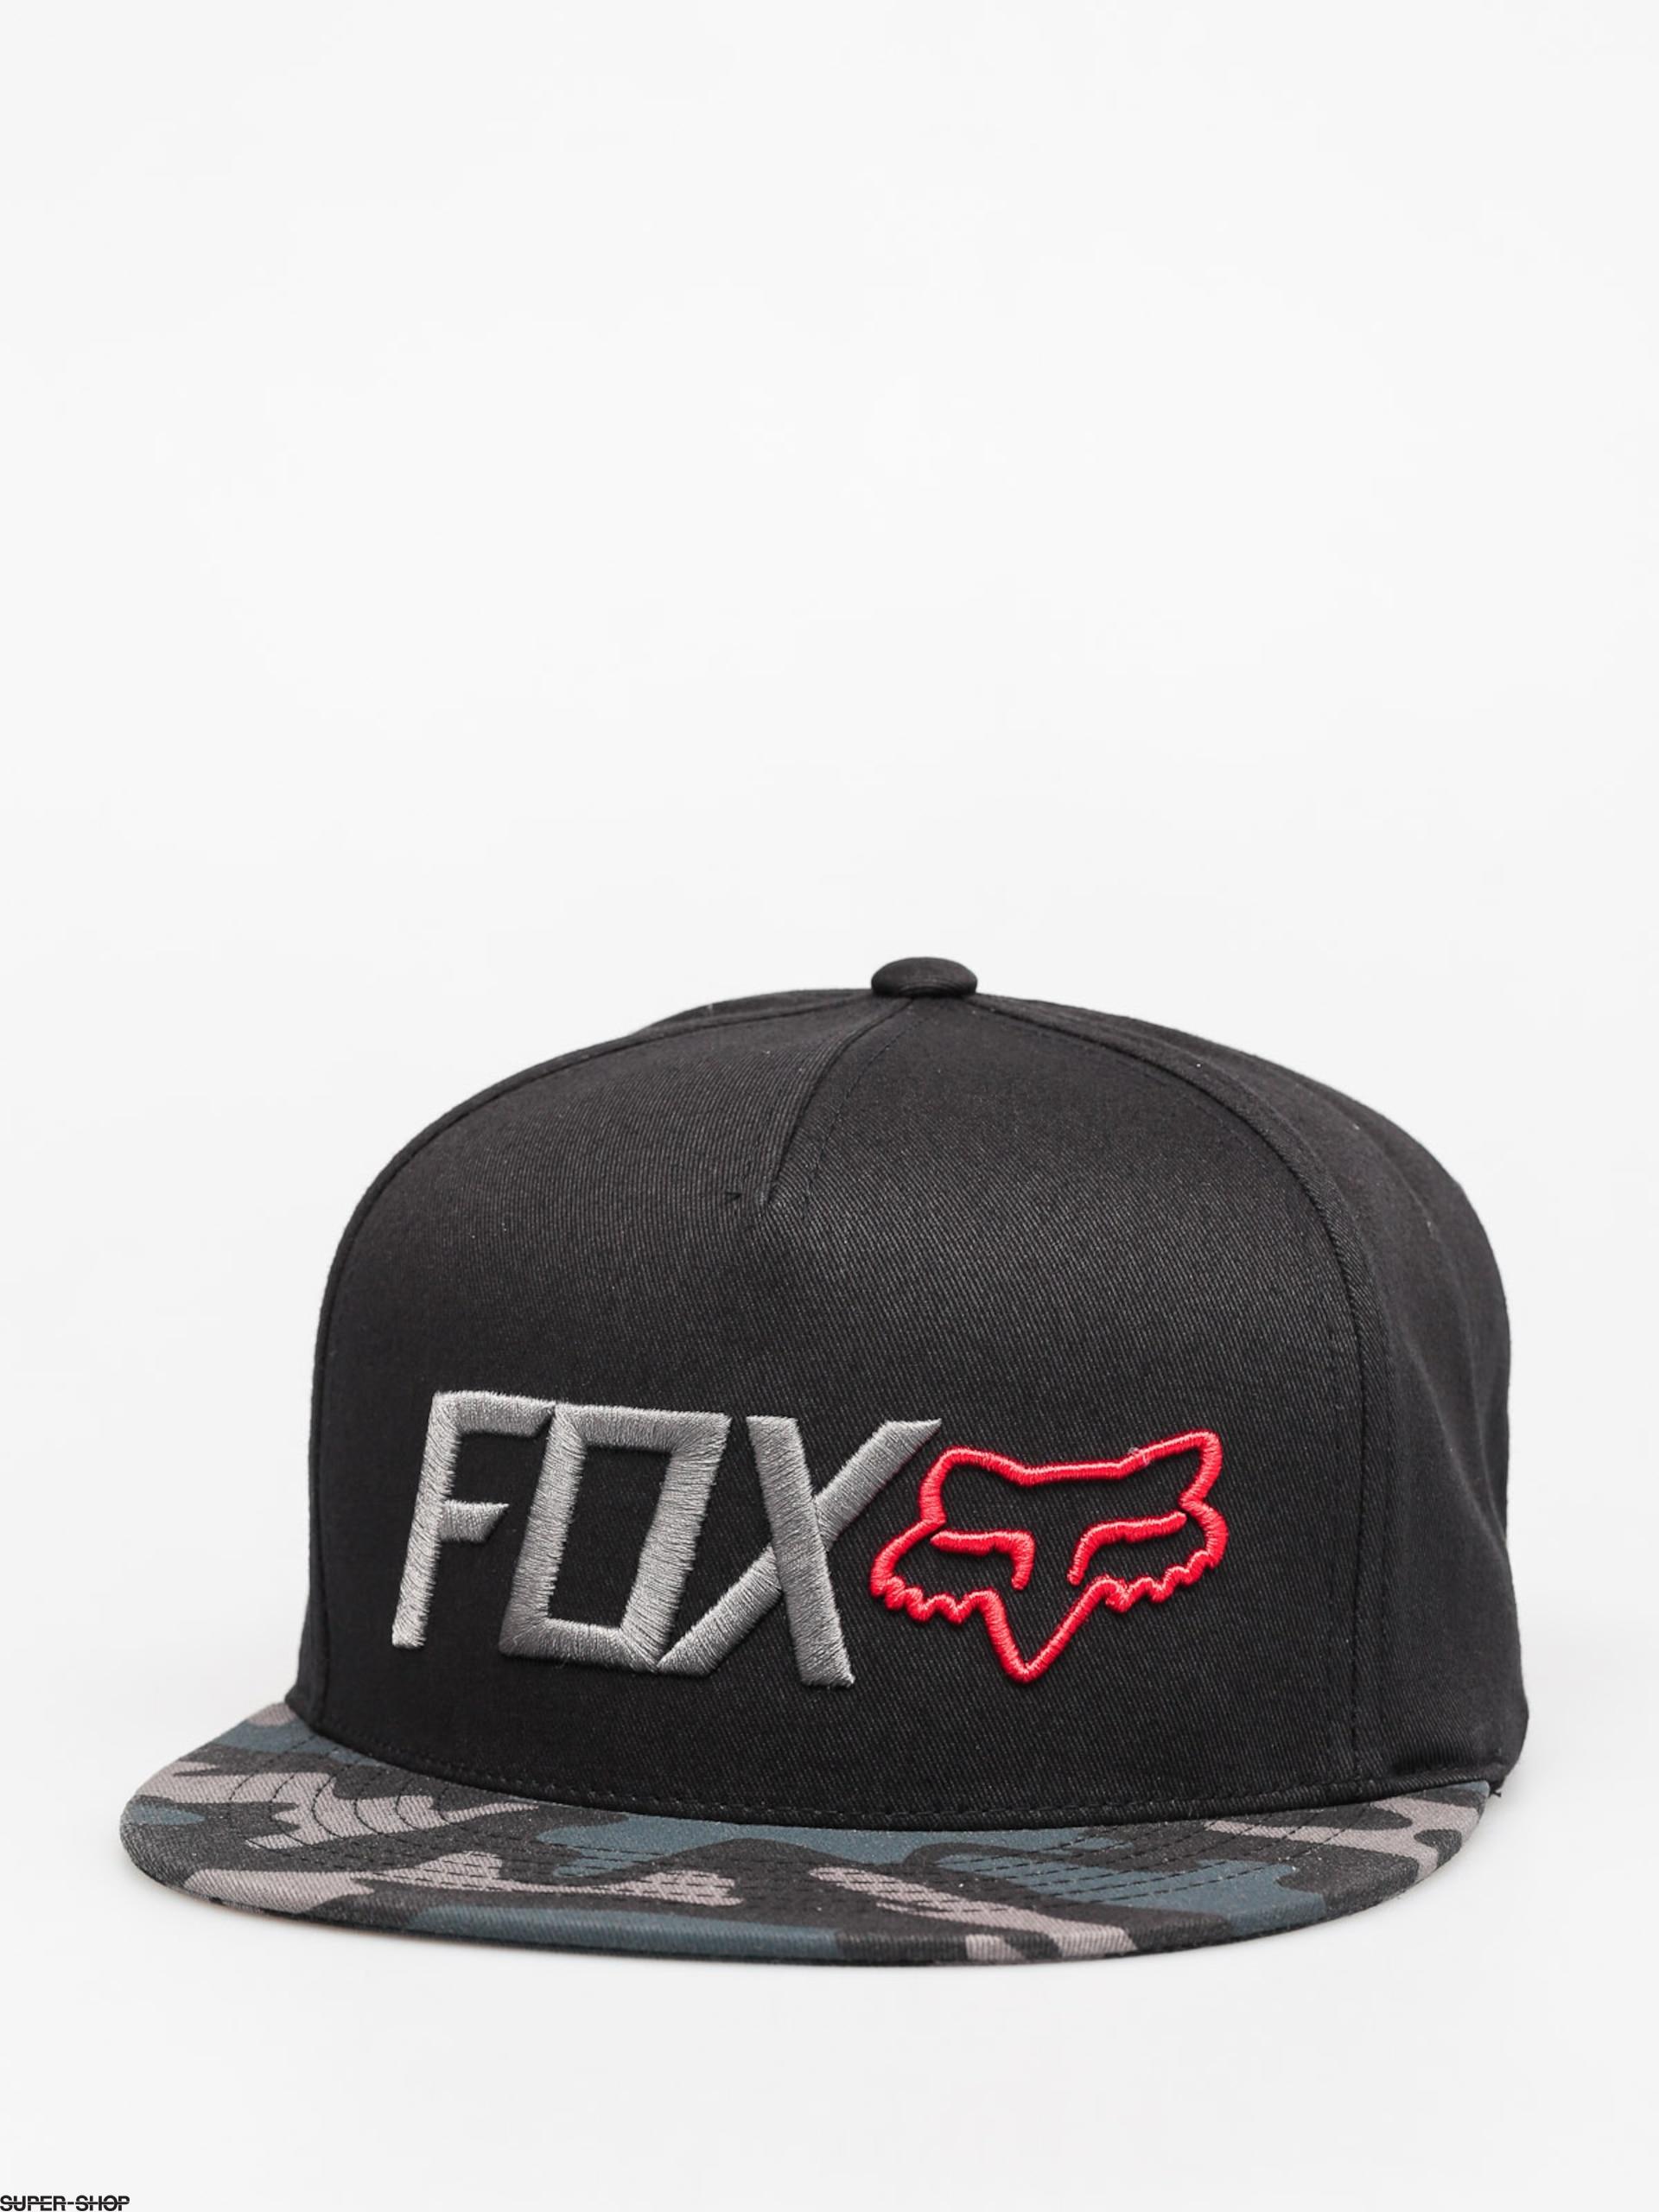 ab815c7264b 844418-w1920-fox-cap-obsessed-snapback-zd-black-camo.jpg